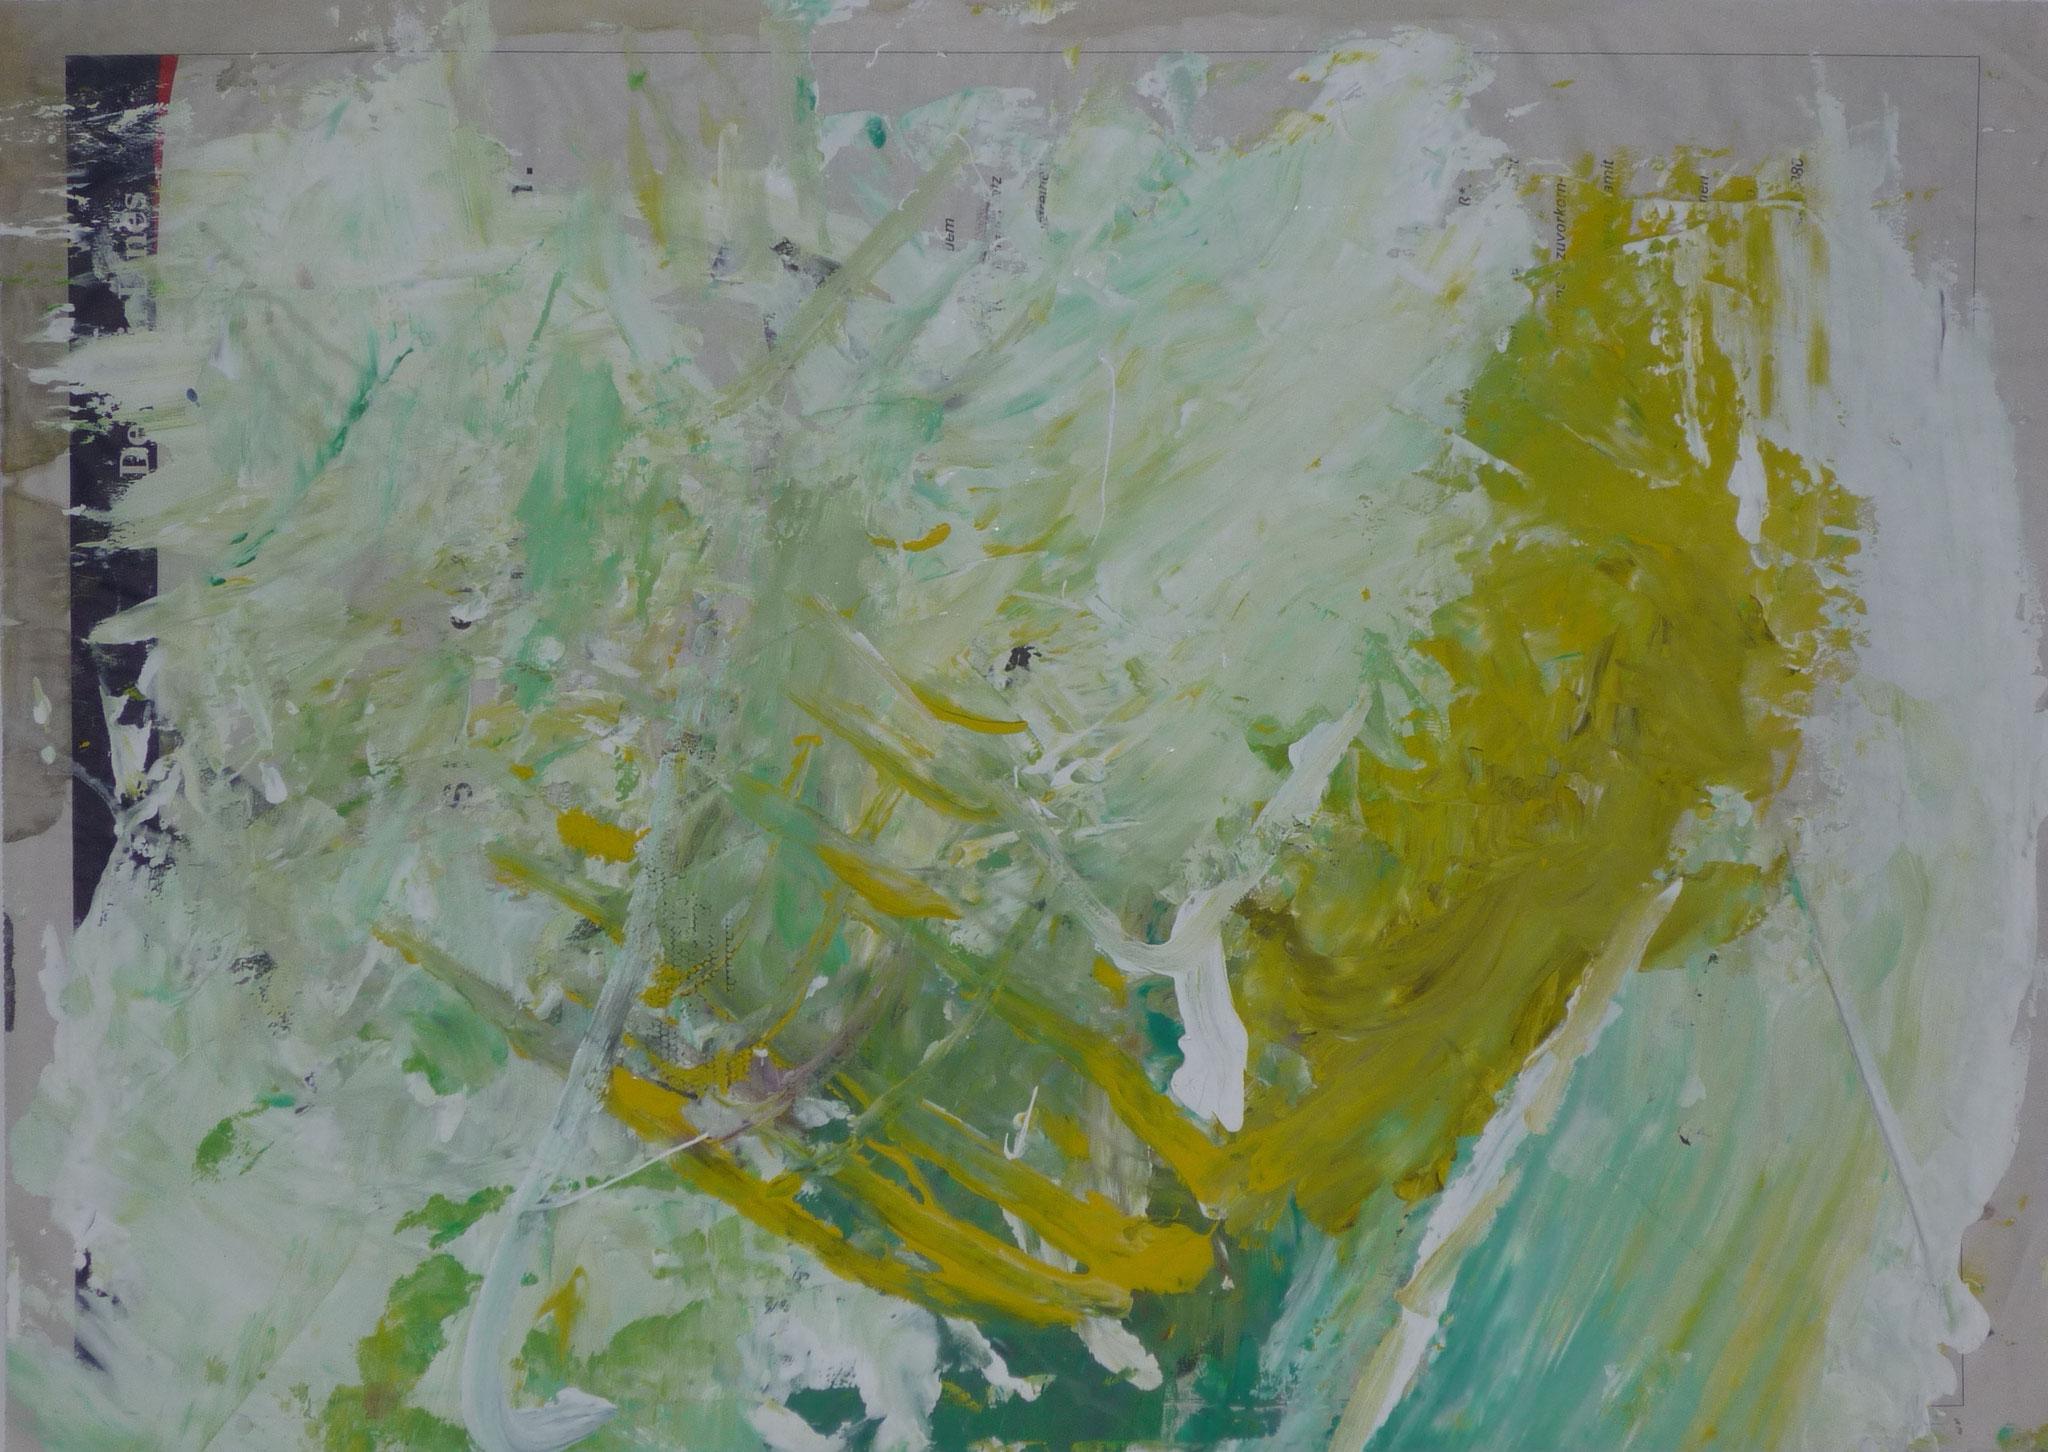 Mess Painting III, 1997